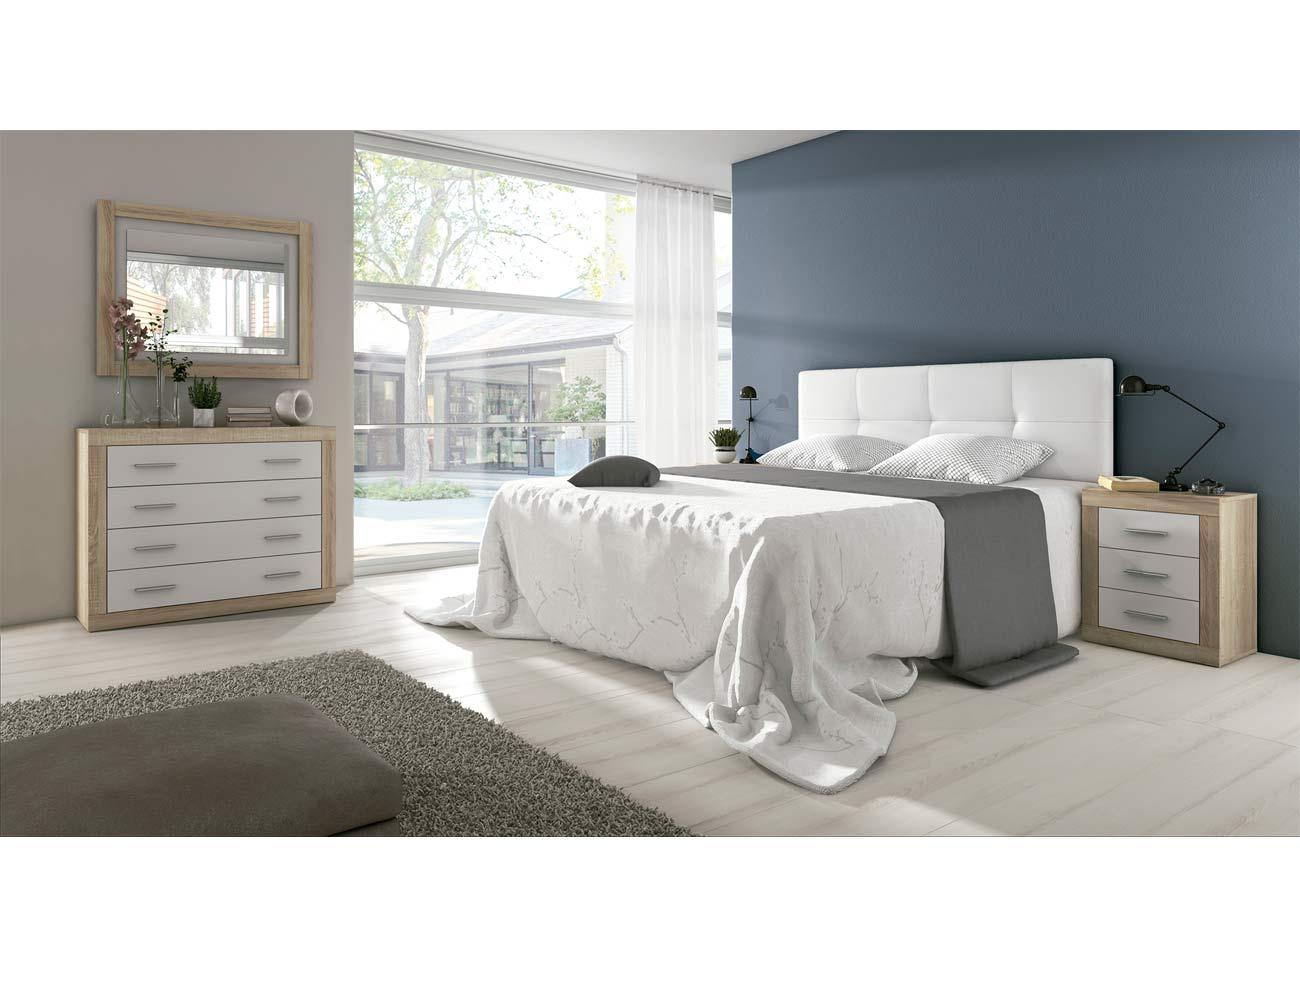 10 dormitorio matrimonio polipiel comoda cambrian blanco